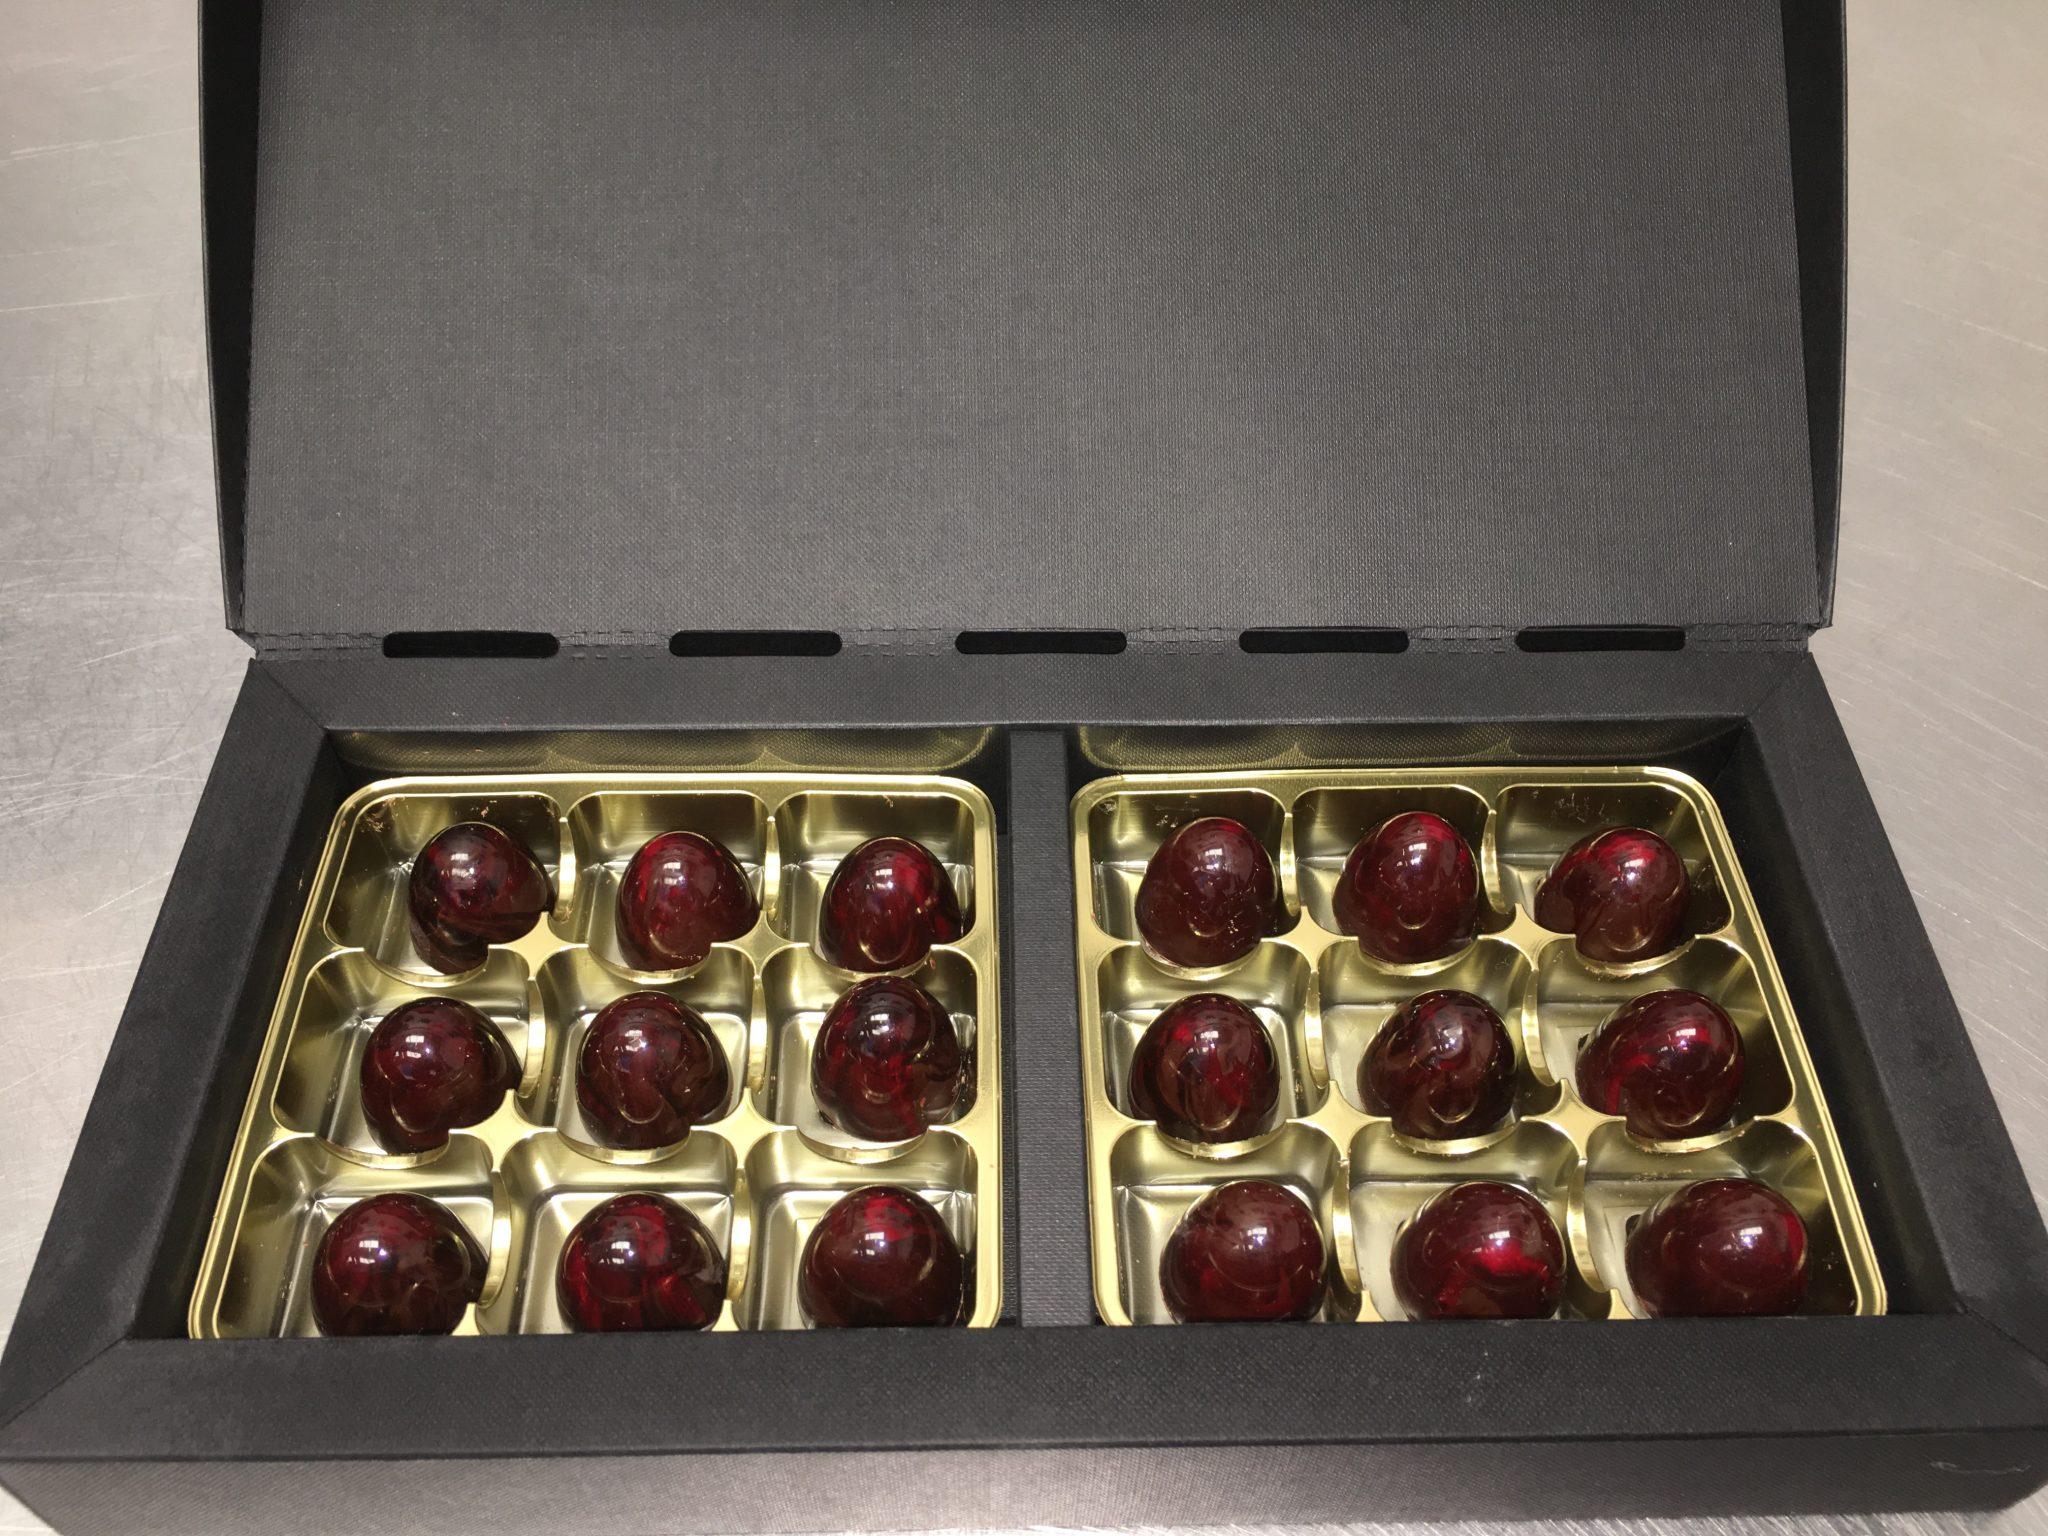 Raspberry Infusion Chcolates